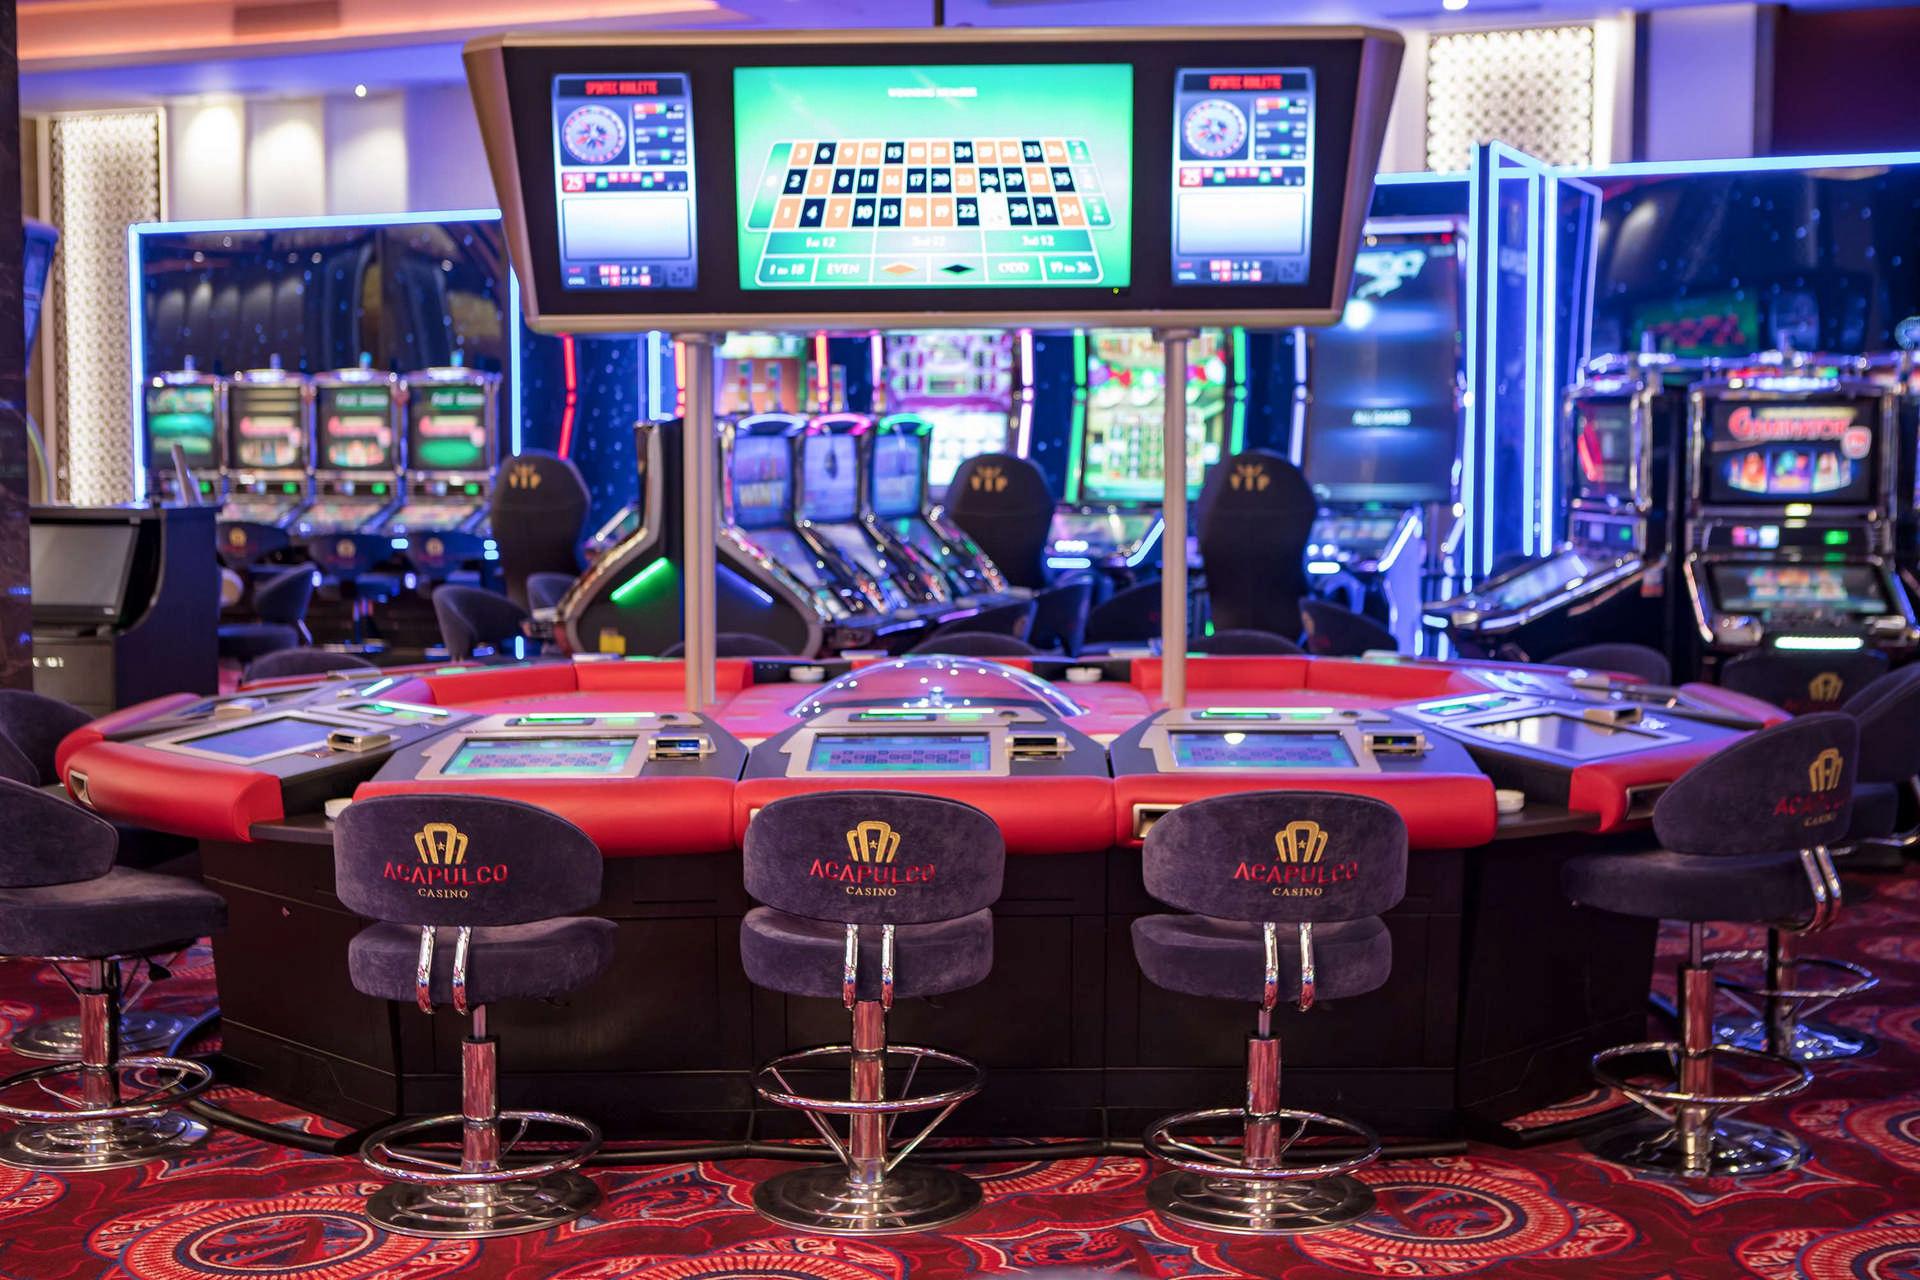 Казино на кипре акапулько аттендант в казино